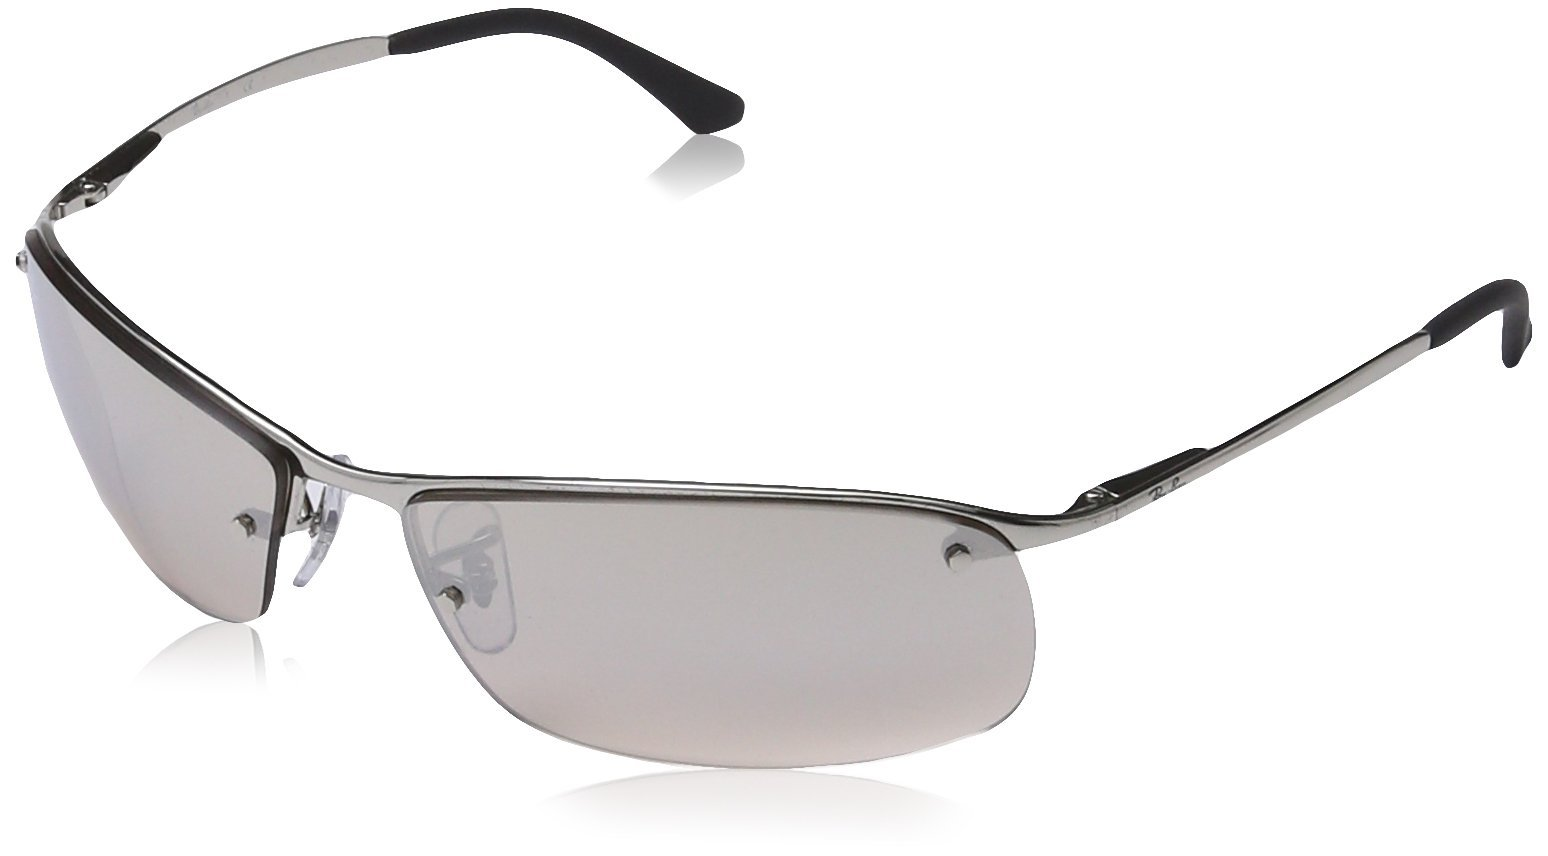 0595dc454a8 Ray-Ban Mens Sunglasses (RB3183) Silver Grey and 50 similar items